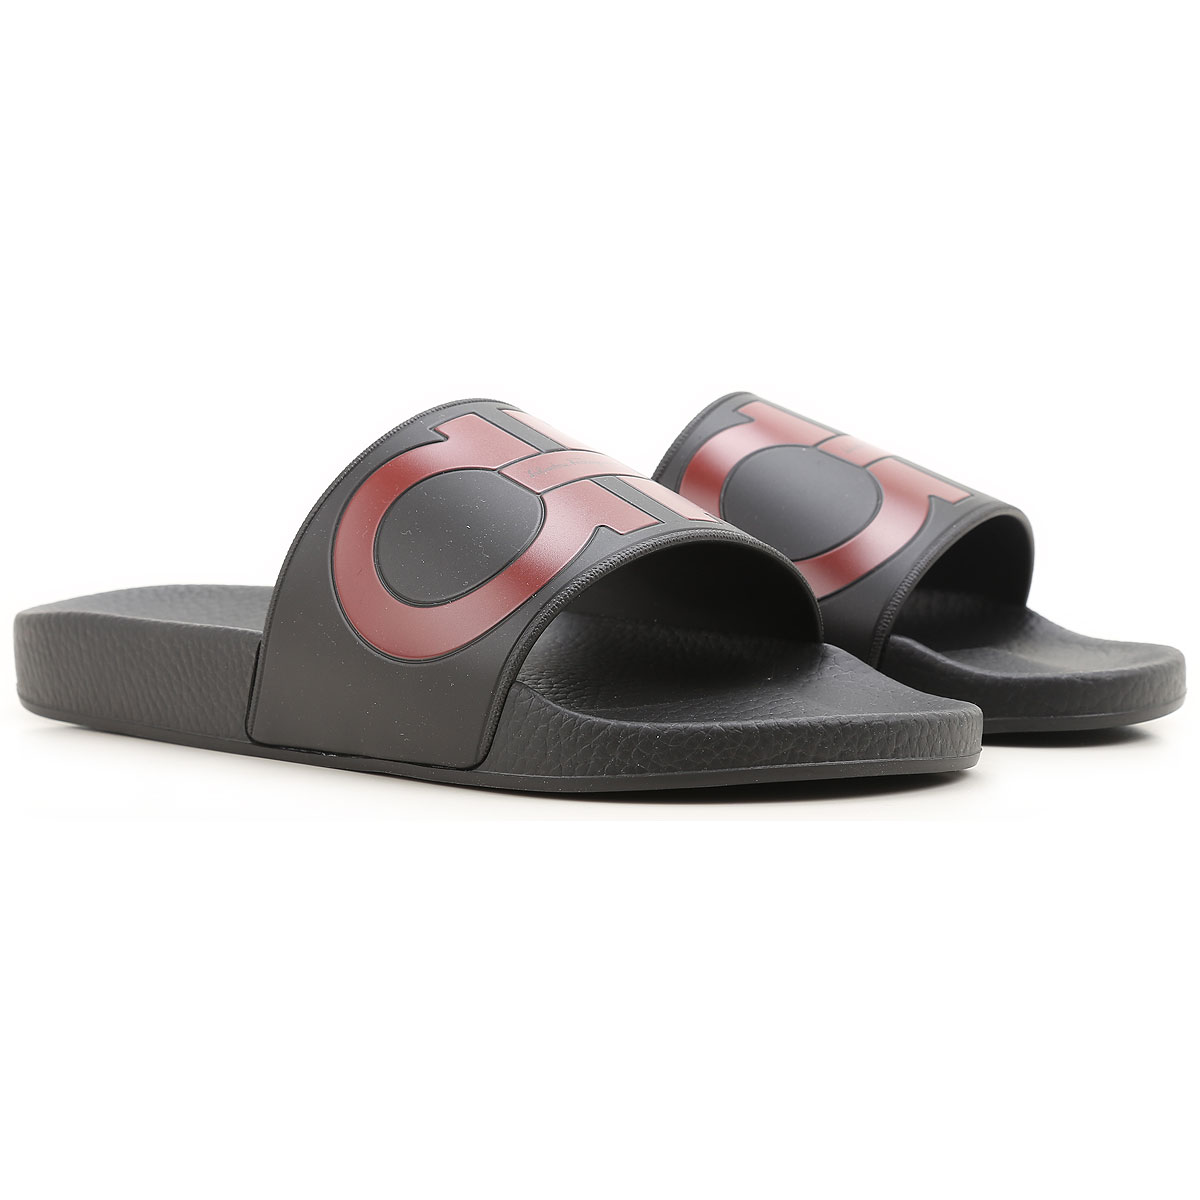 Homme Groove Chaussures FerragamoCode Salvatore Produit654665 TculJ3FK1